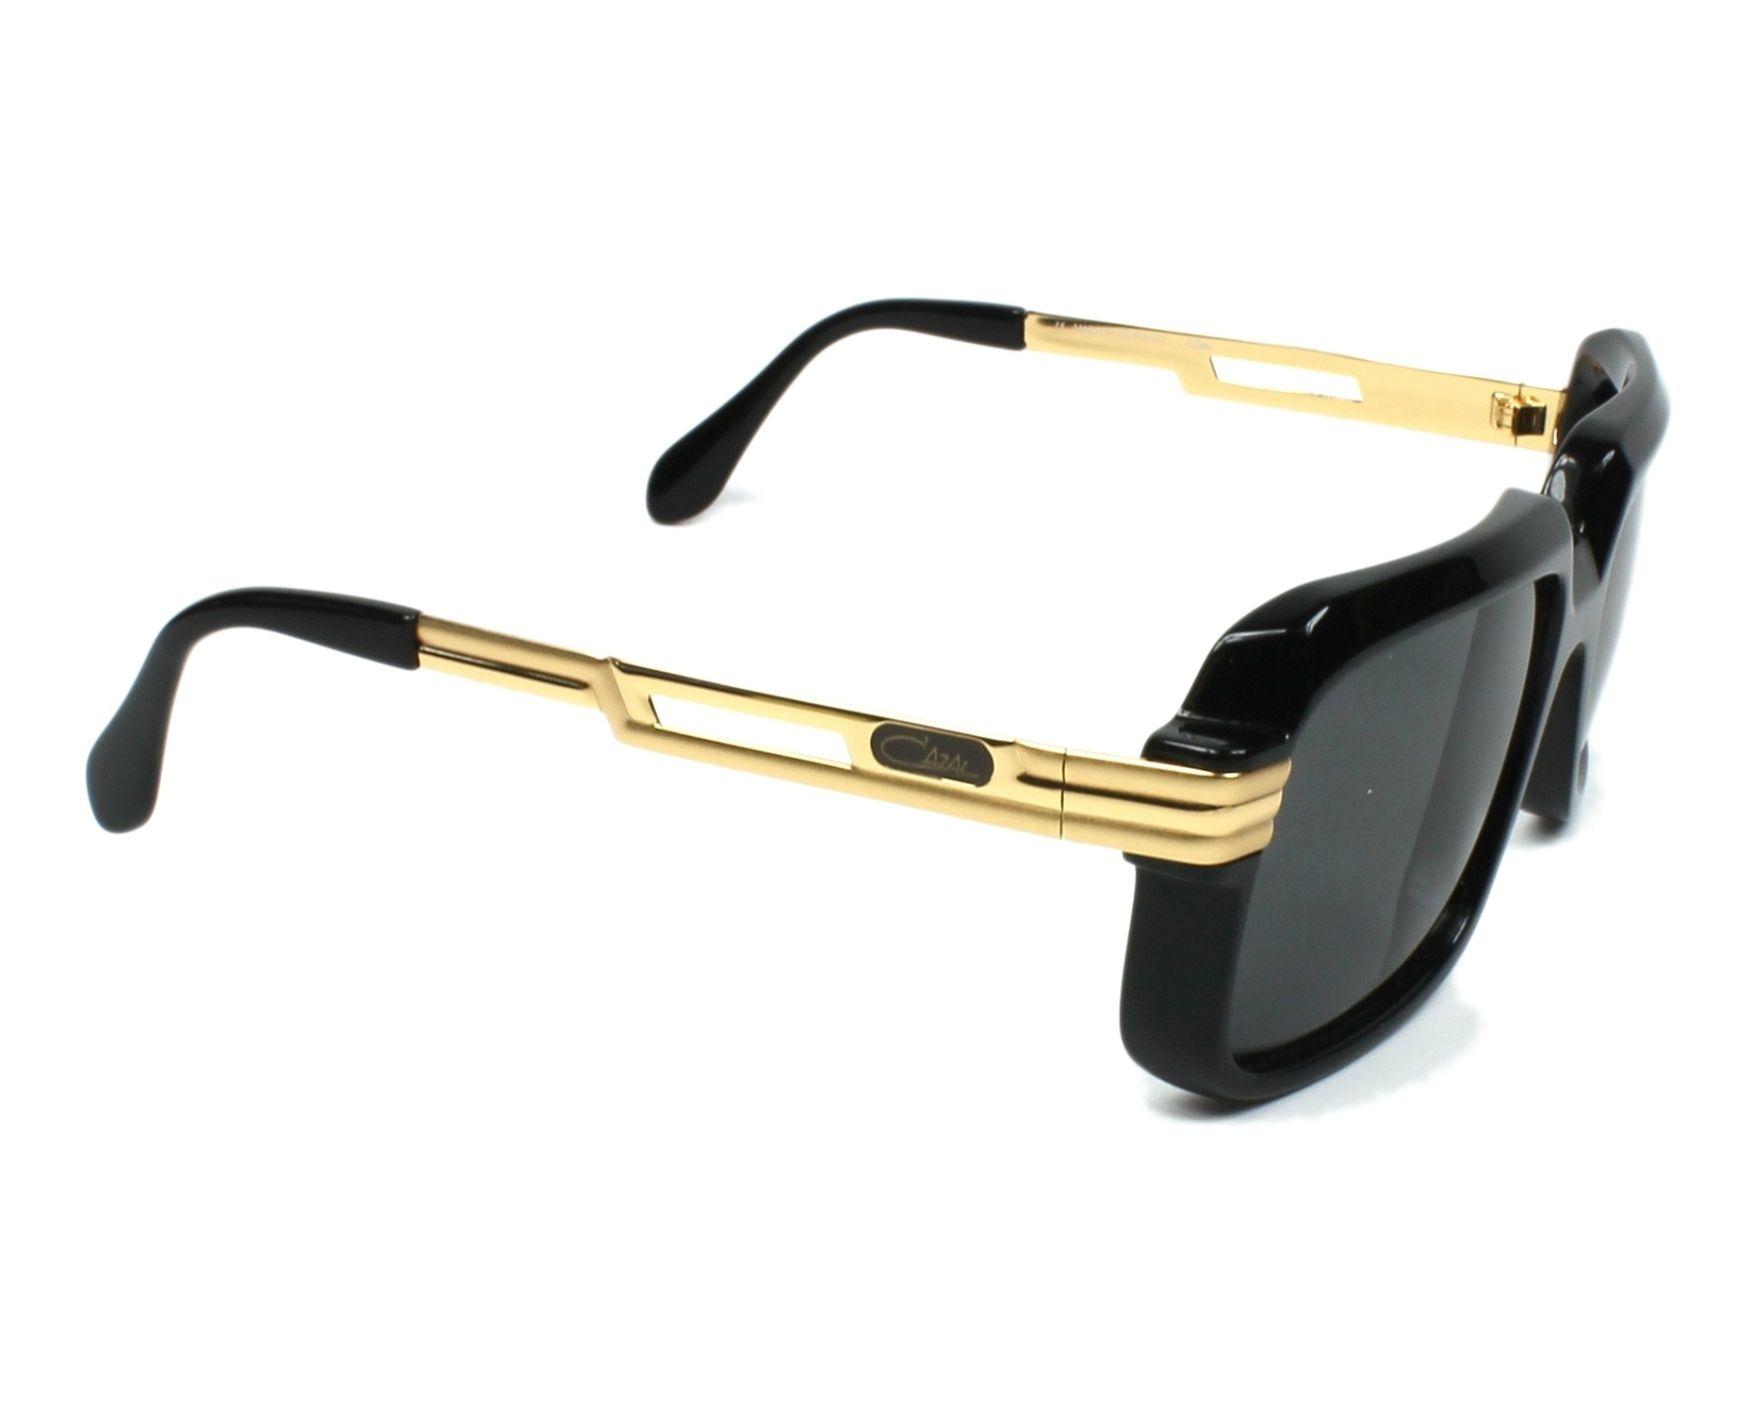 bbdb4902e46b Sunglasses Cazal 607-2-3 001 - Black Gold side view